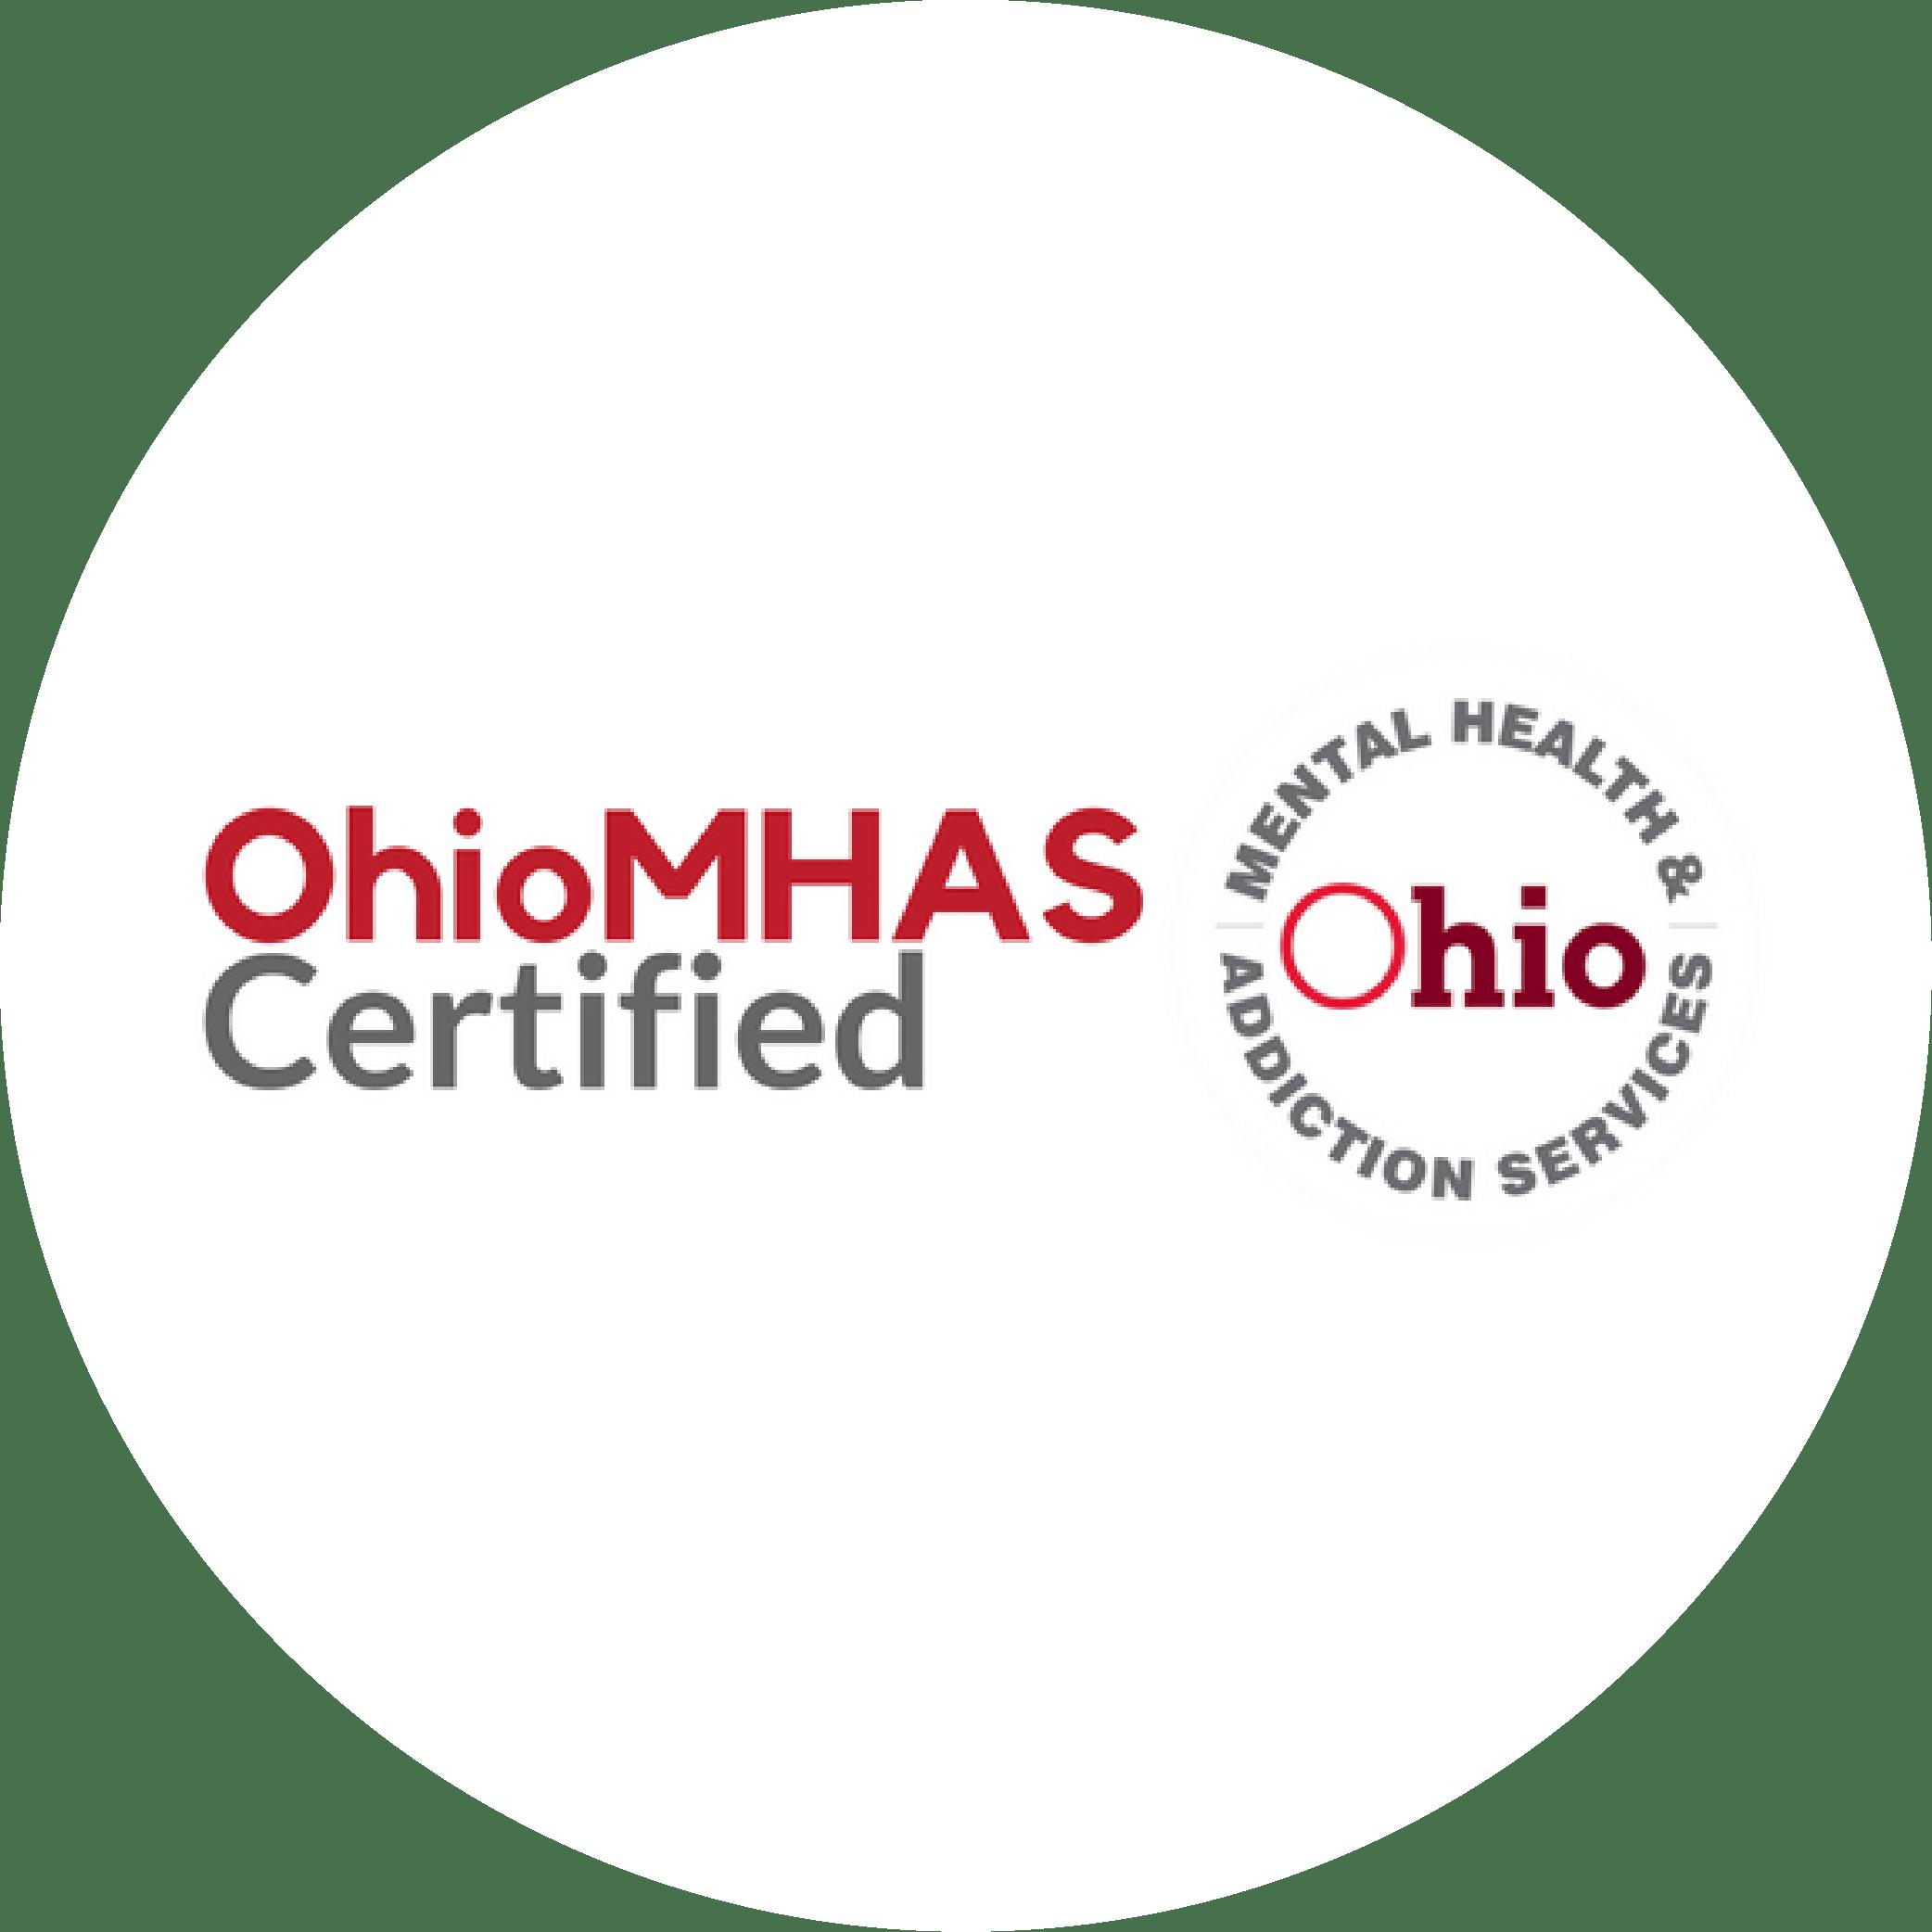 Ohio Mental Health and Addiction Services